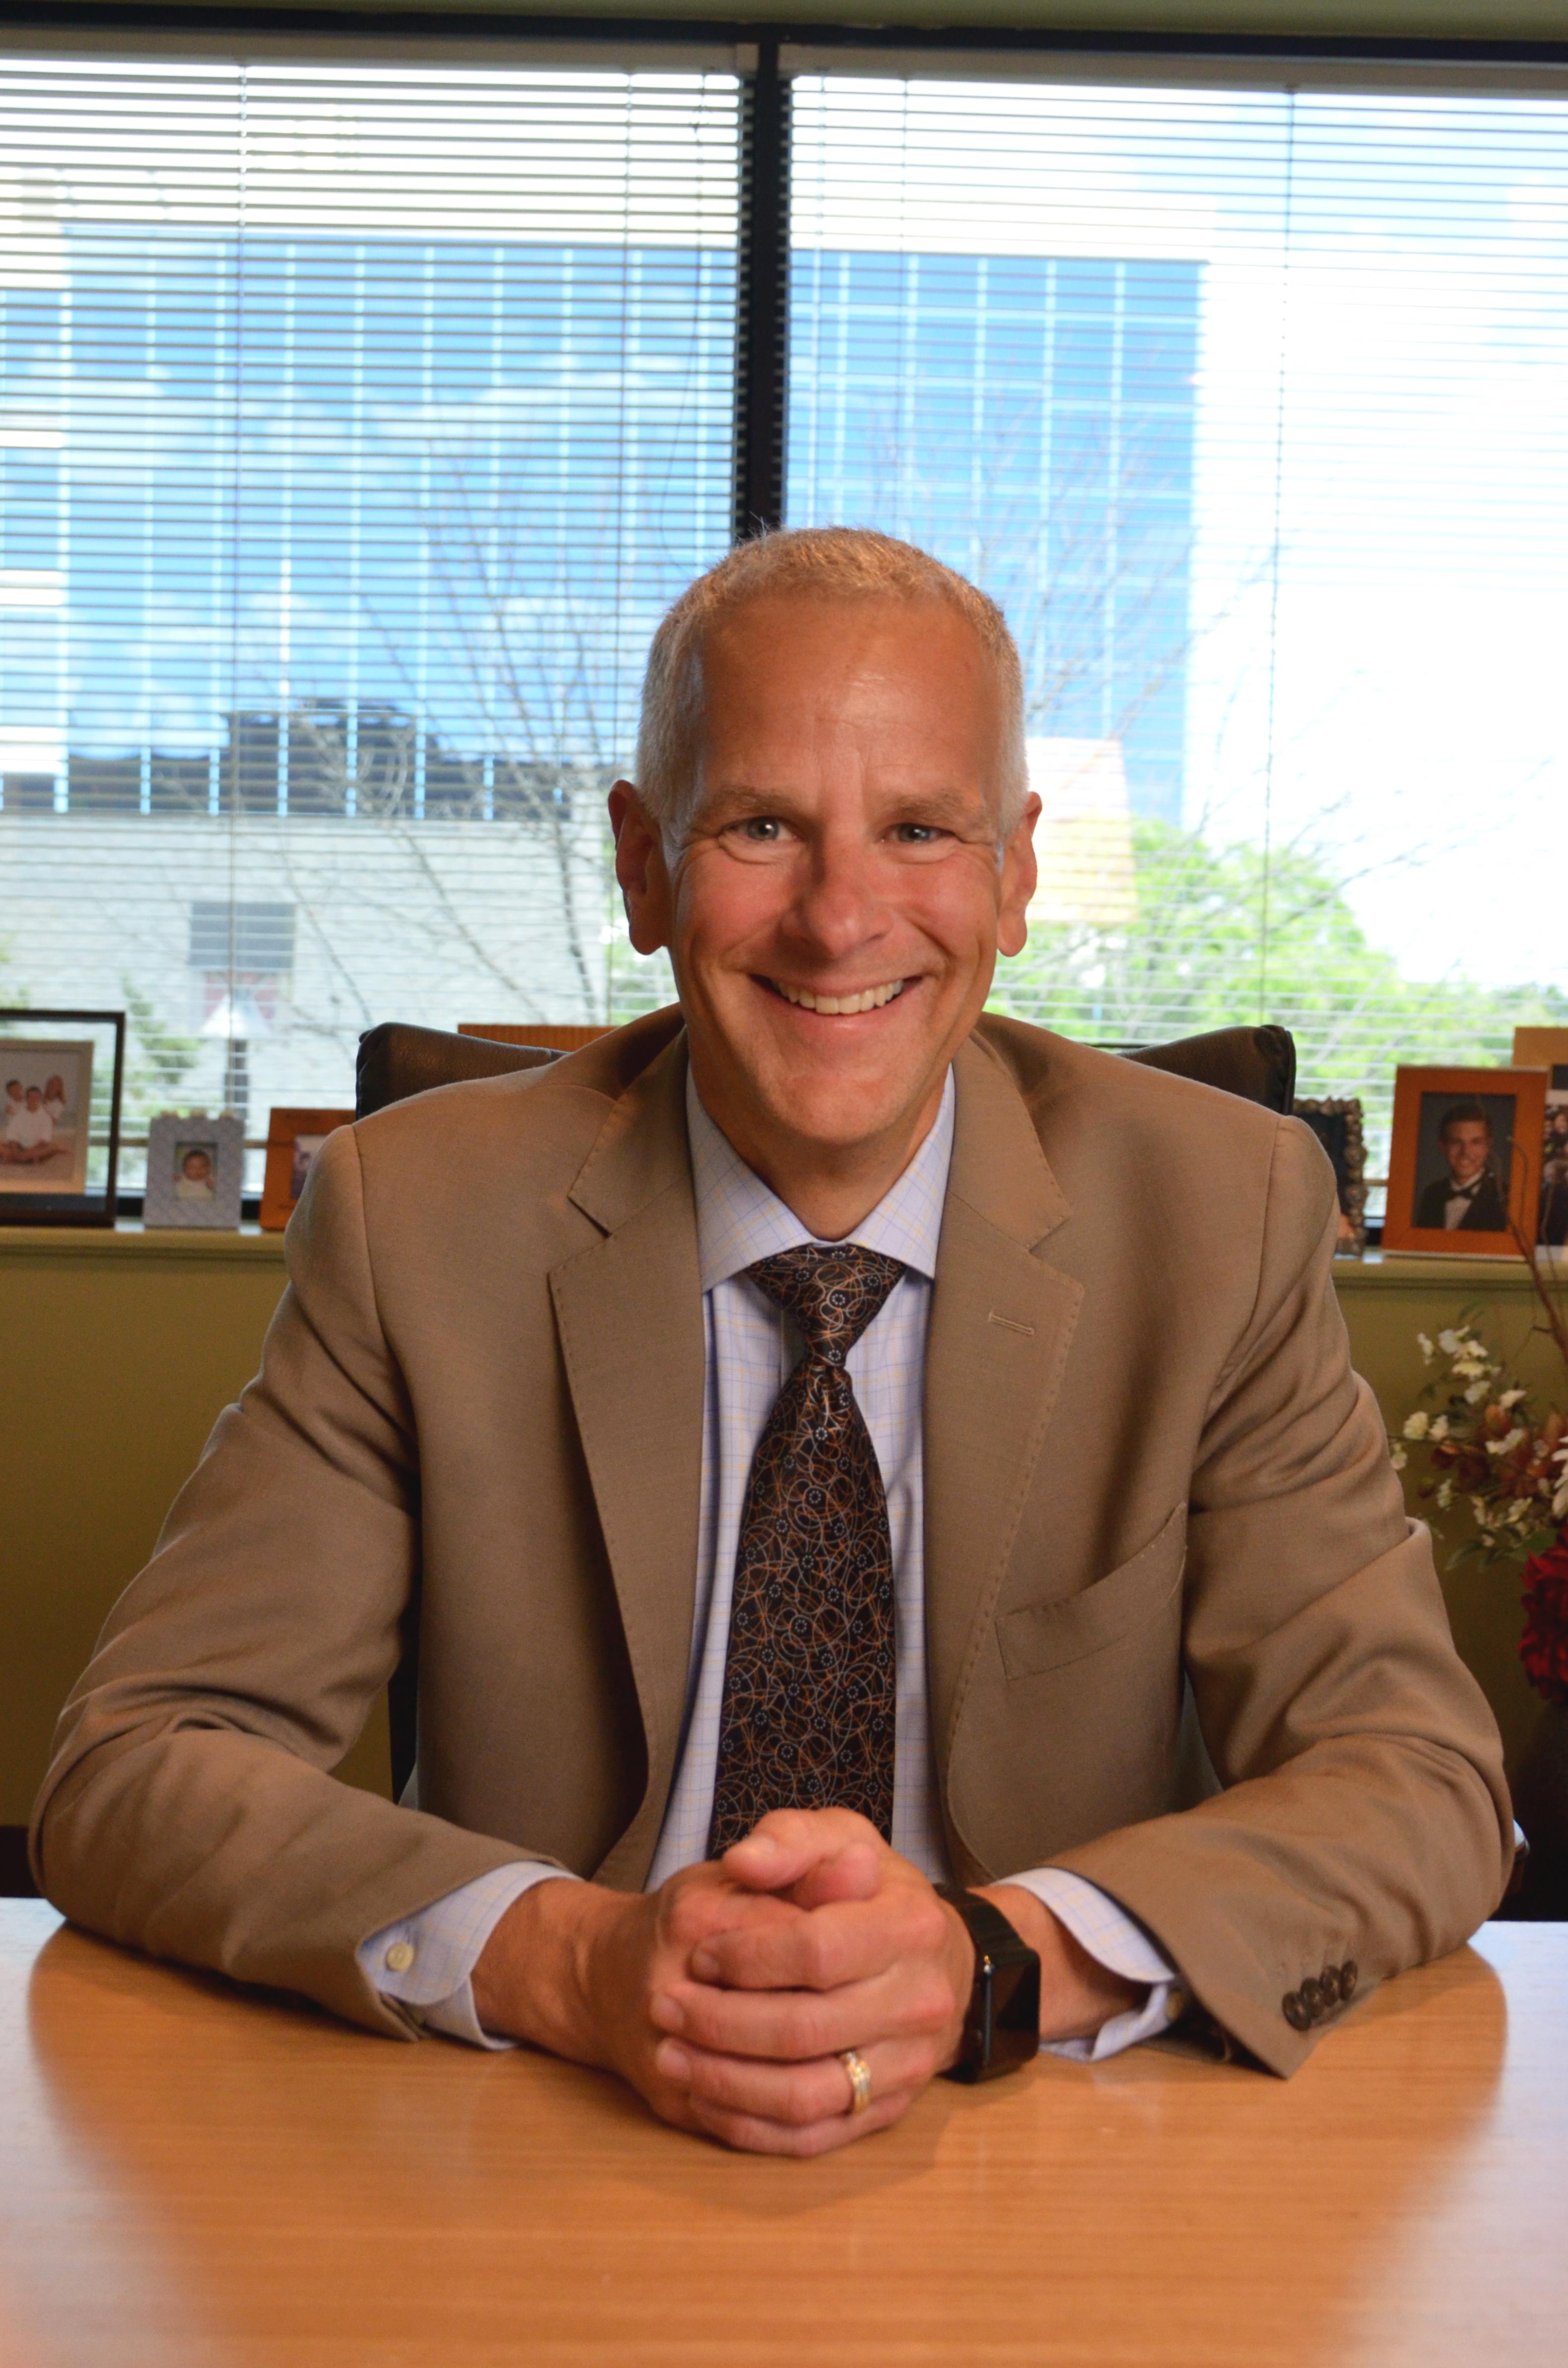 Dave Labuskes